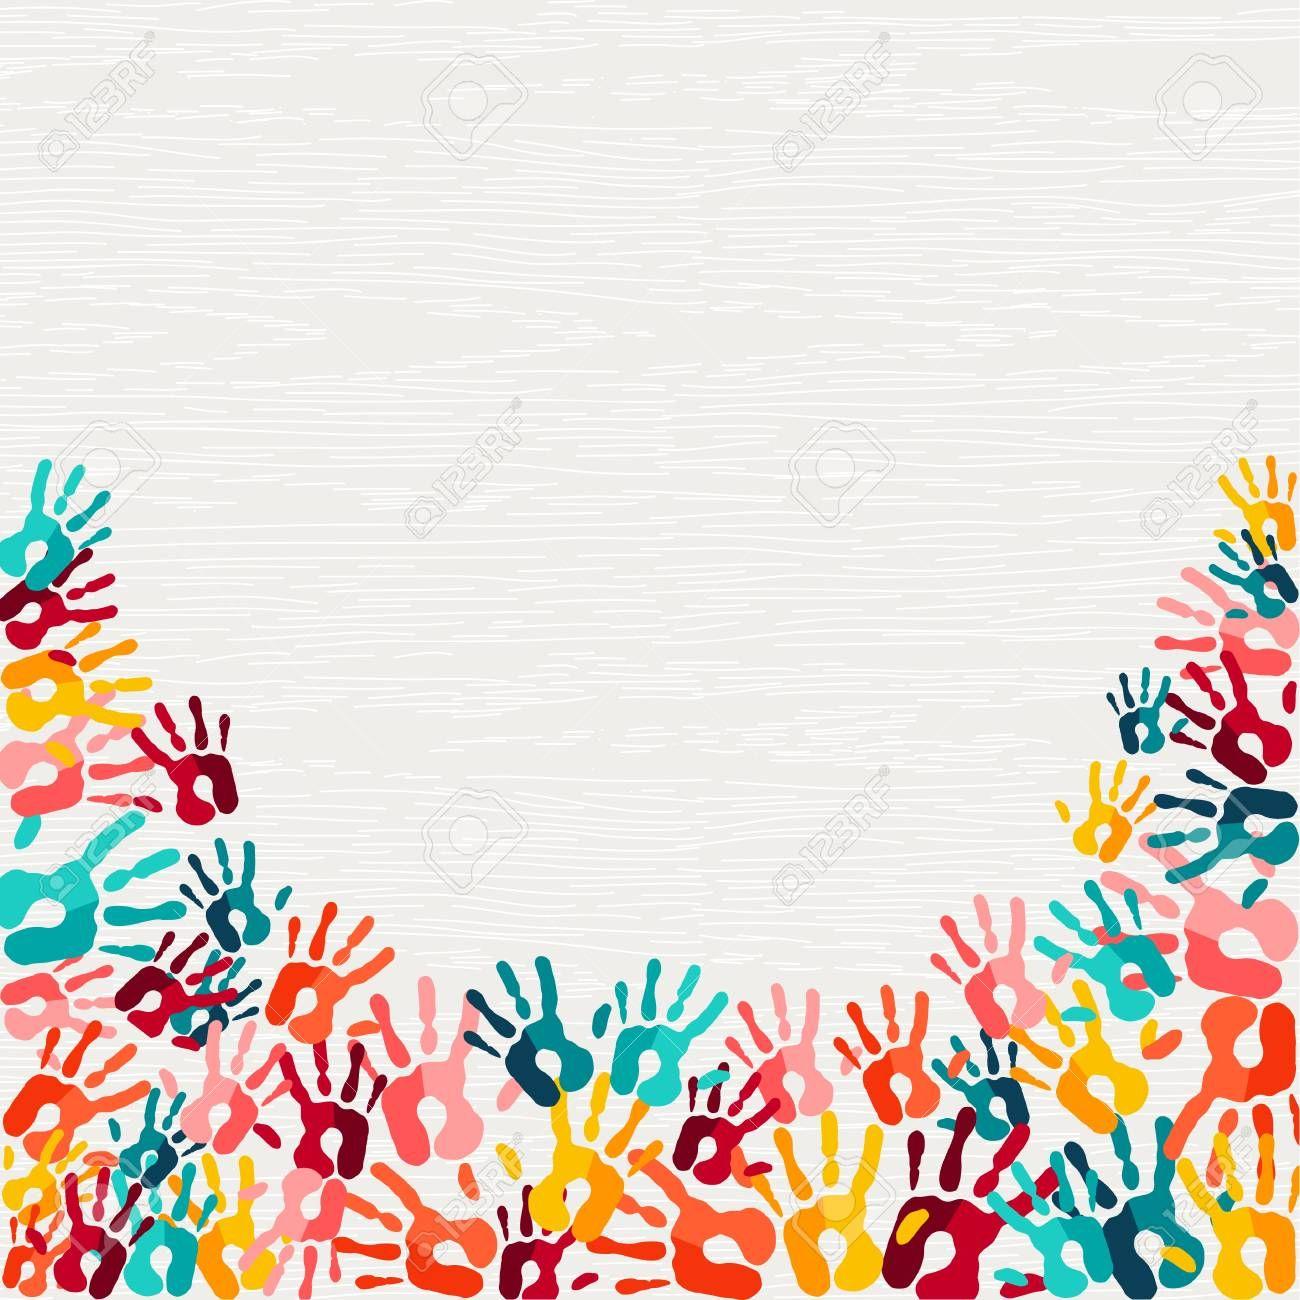 Human Hand Print Color Background Colorful Children Paint Handprints Illustration For Social Community Education Or Teamwork Concept Vector Aff Colorfu